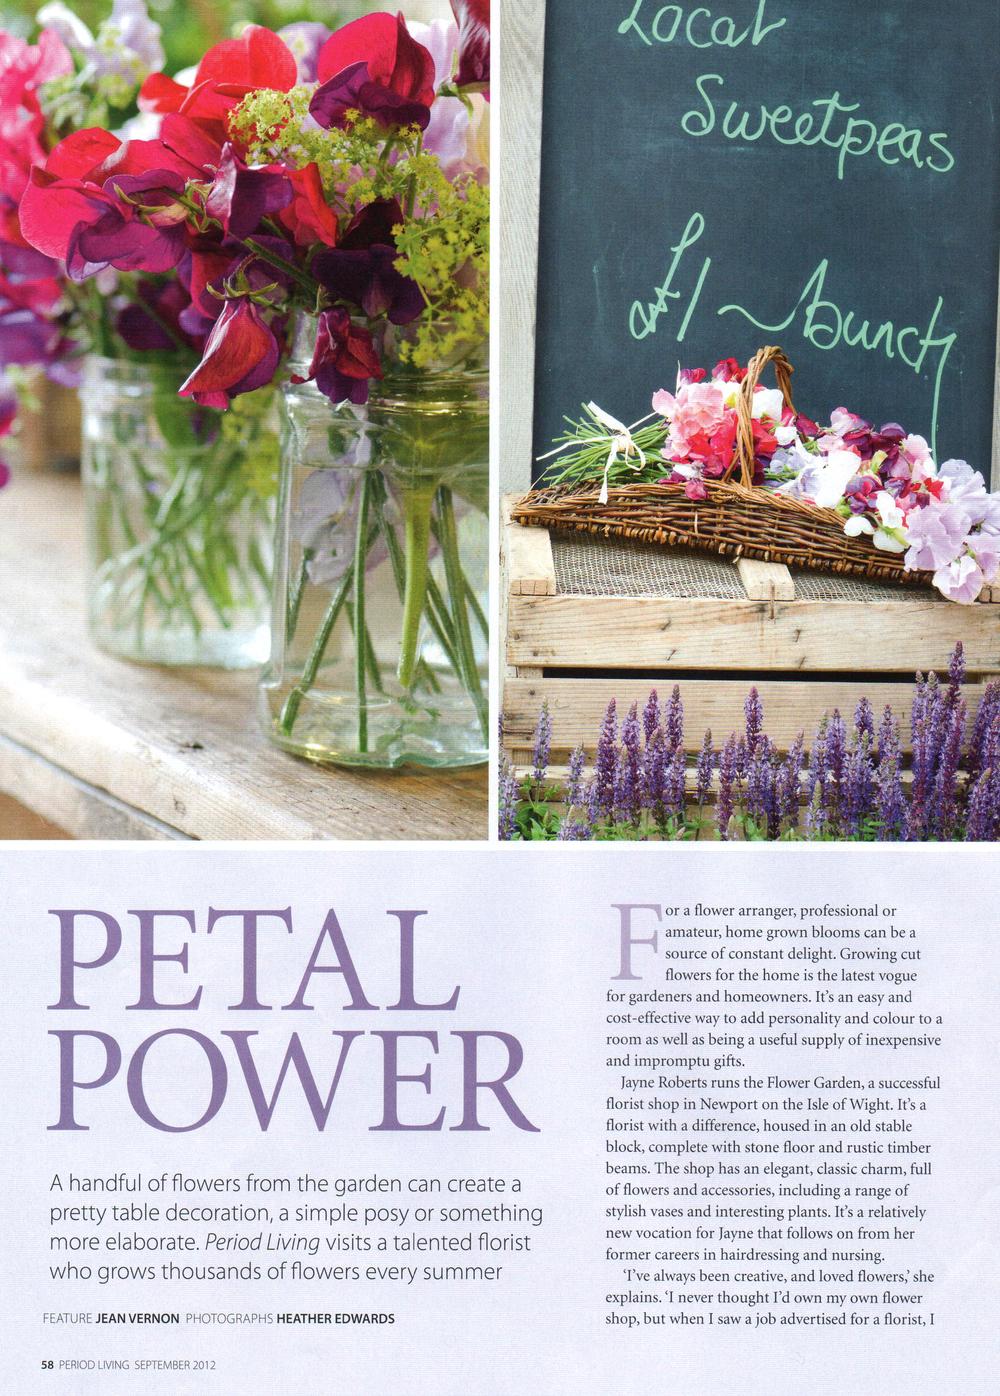 PL-Flower Garden-1.jpg